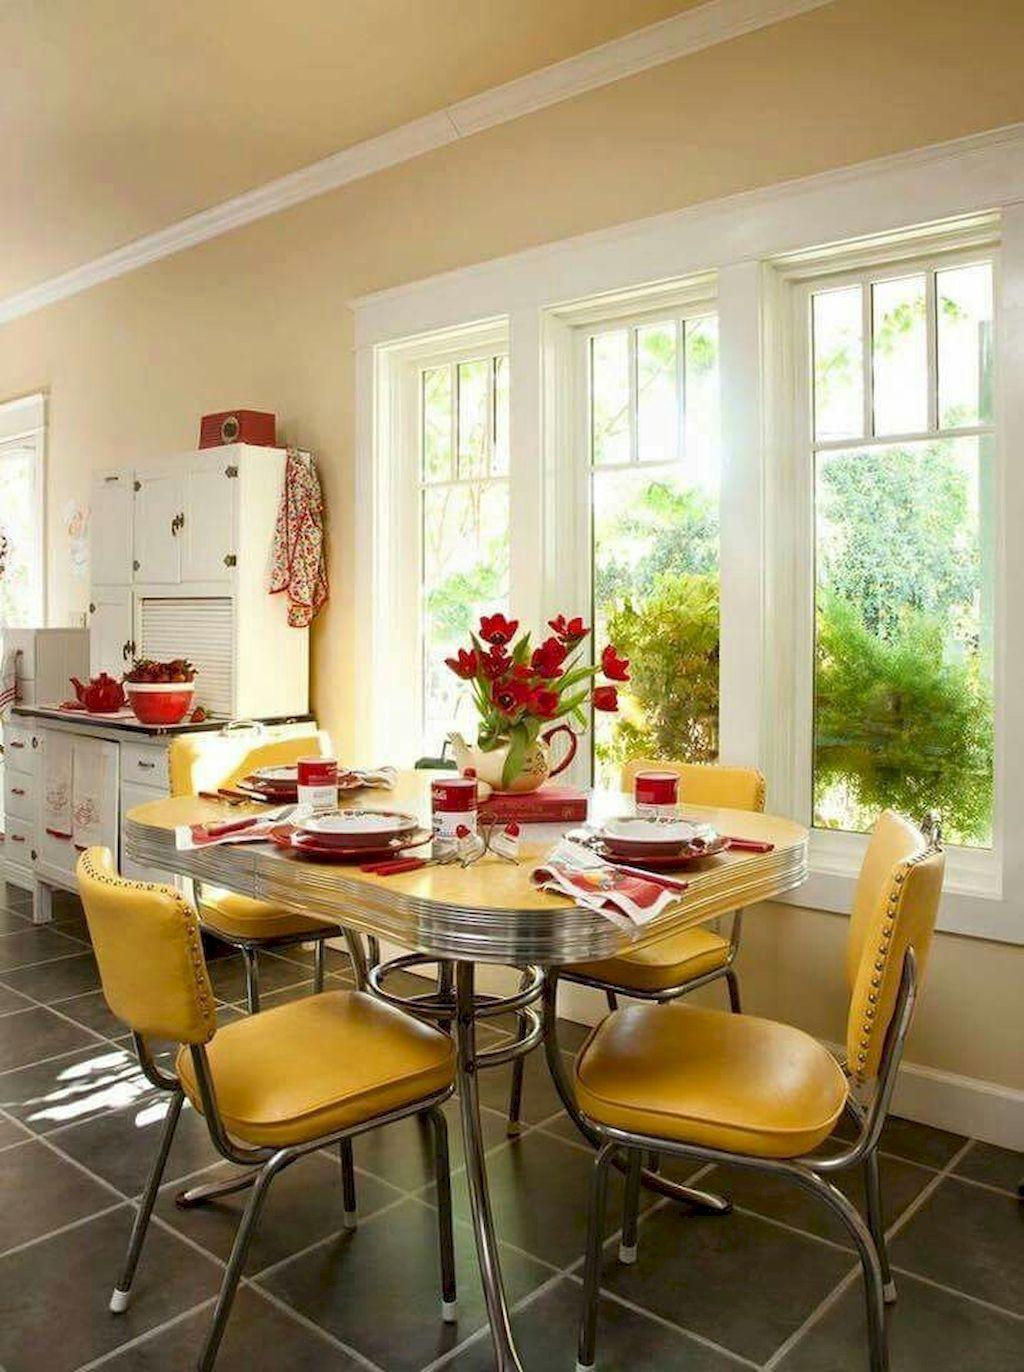 75 Vintage Dining Table Design Ideas Diy 7 In